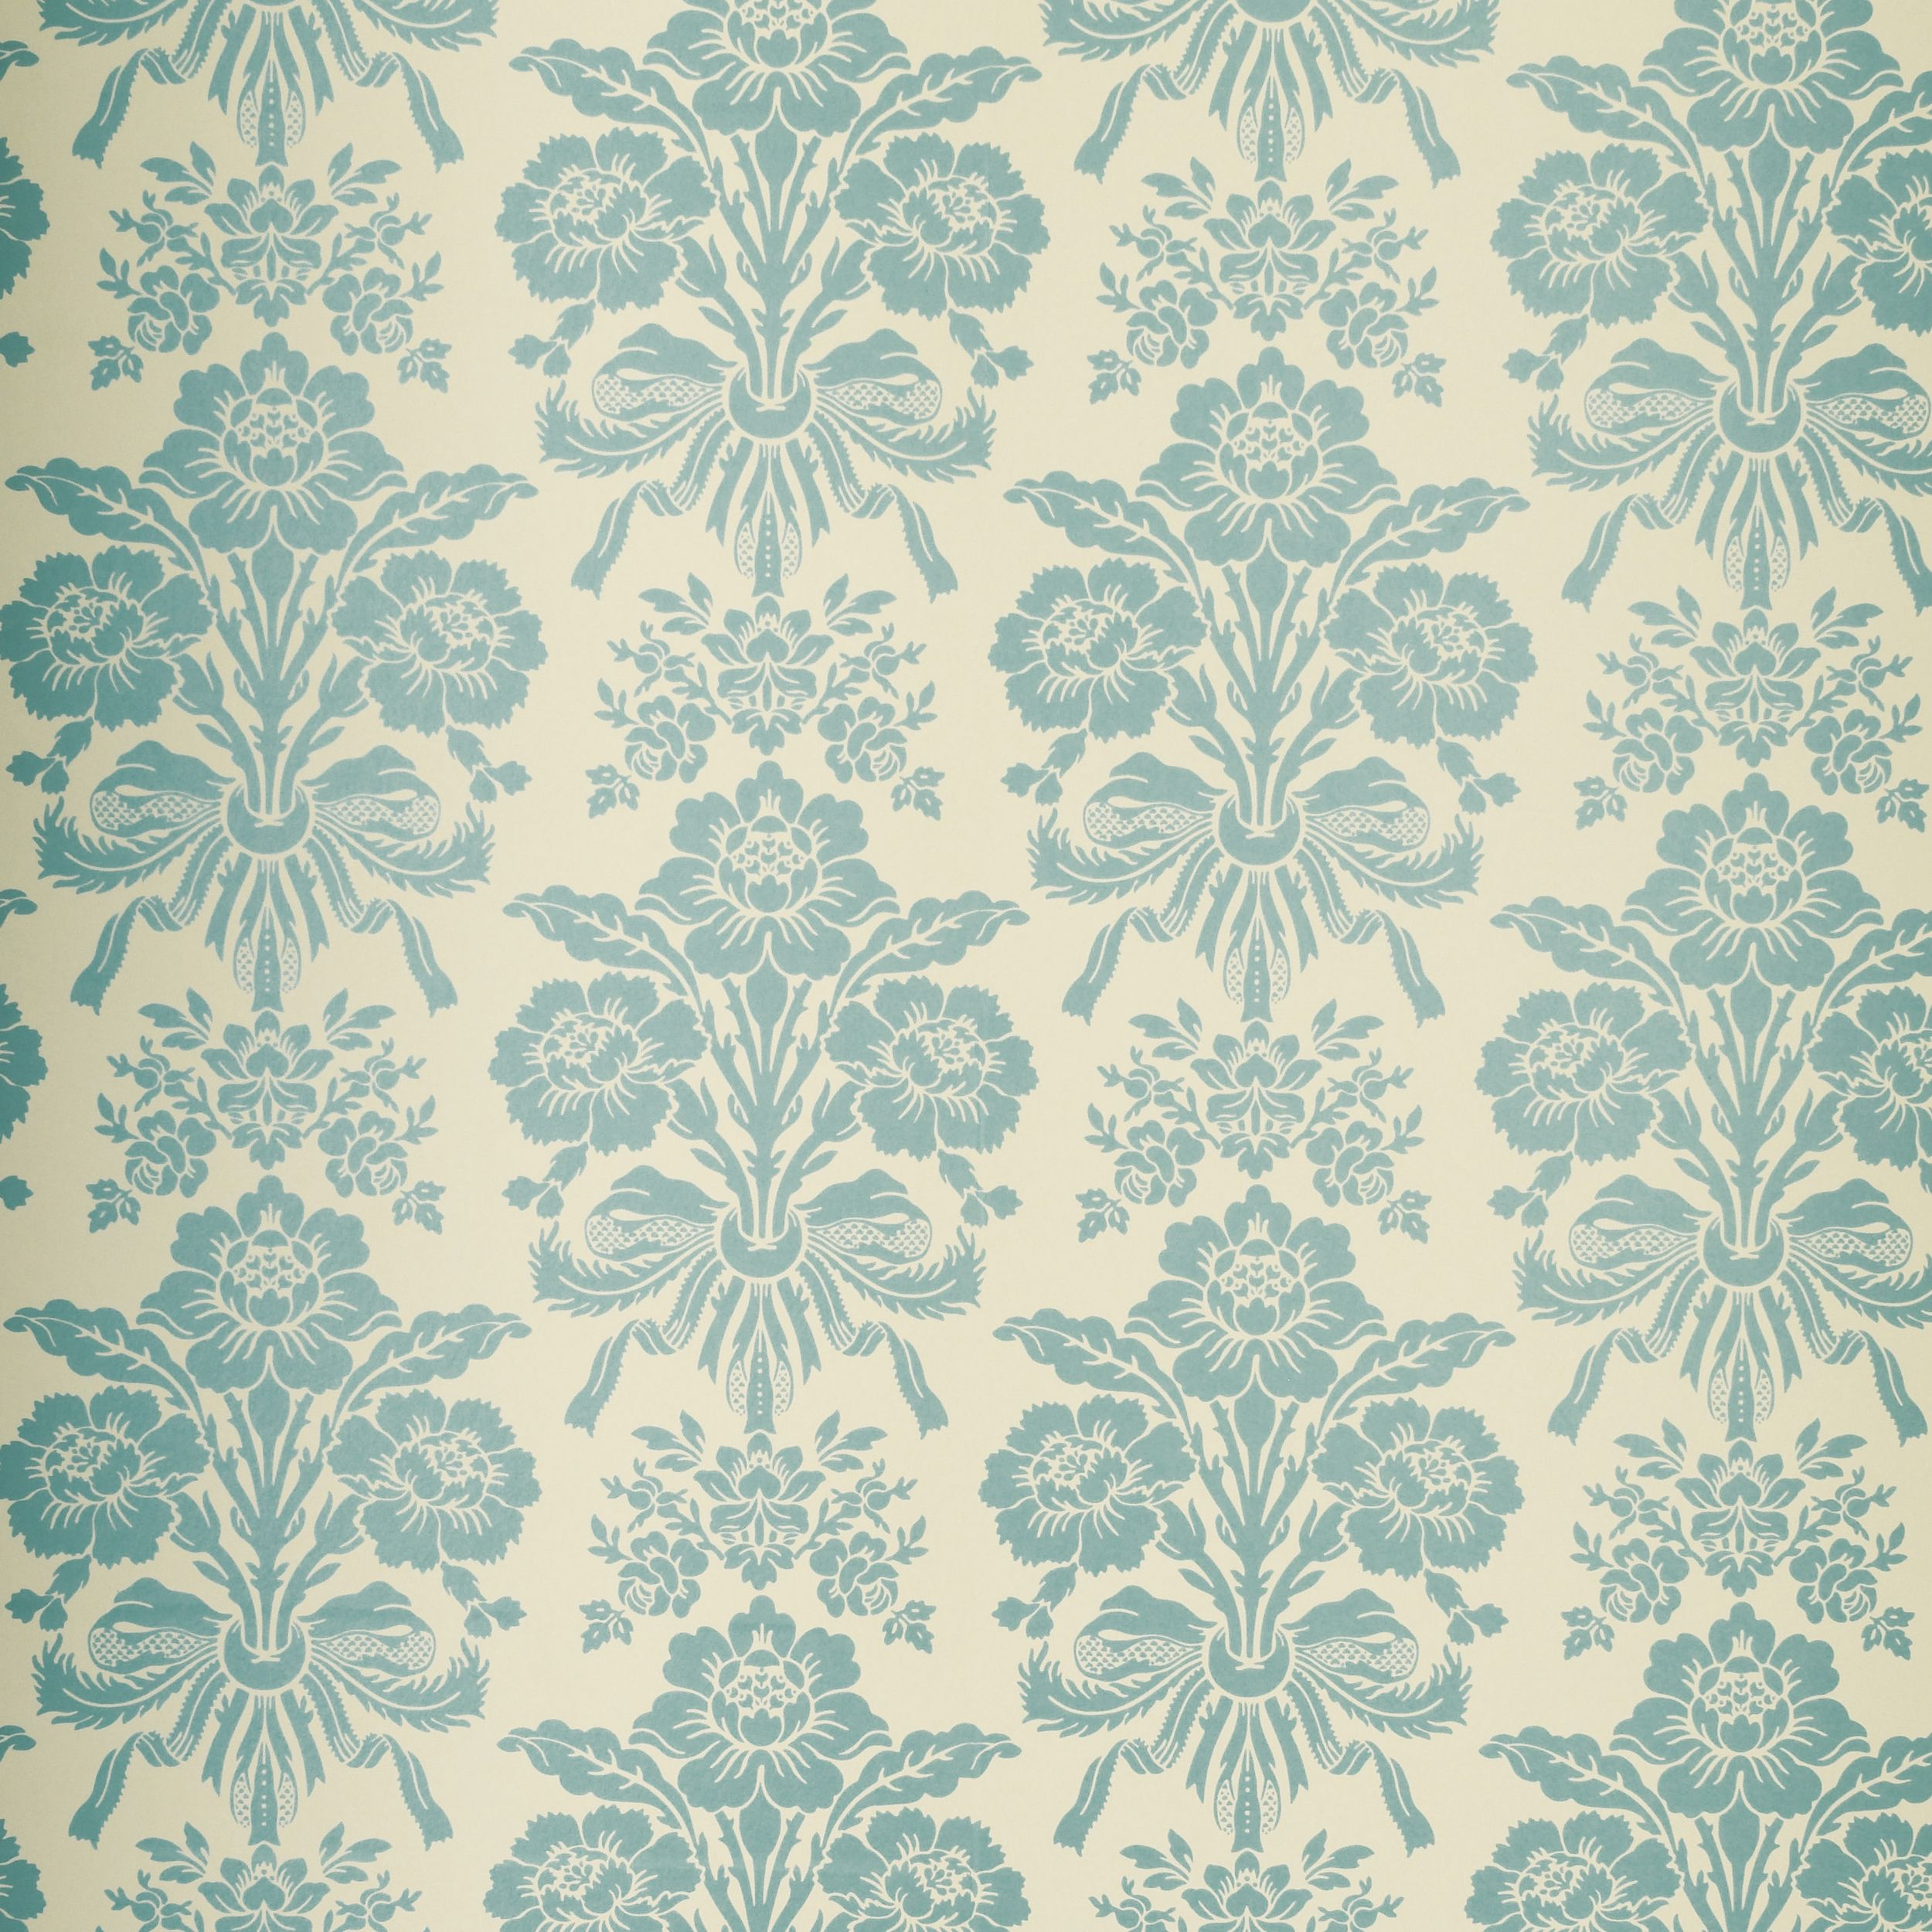 Tatton teal damask wallpaper at laura ashley patterns for Damask wallpaper